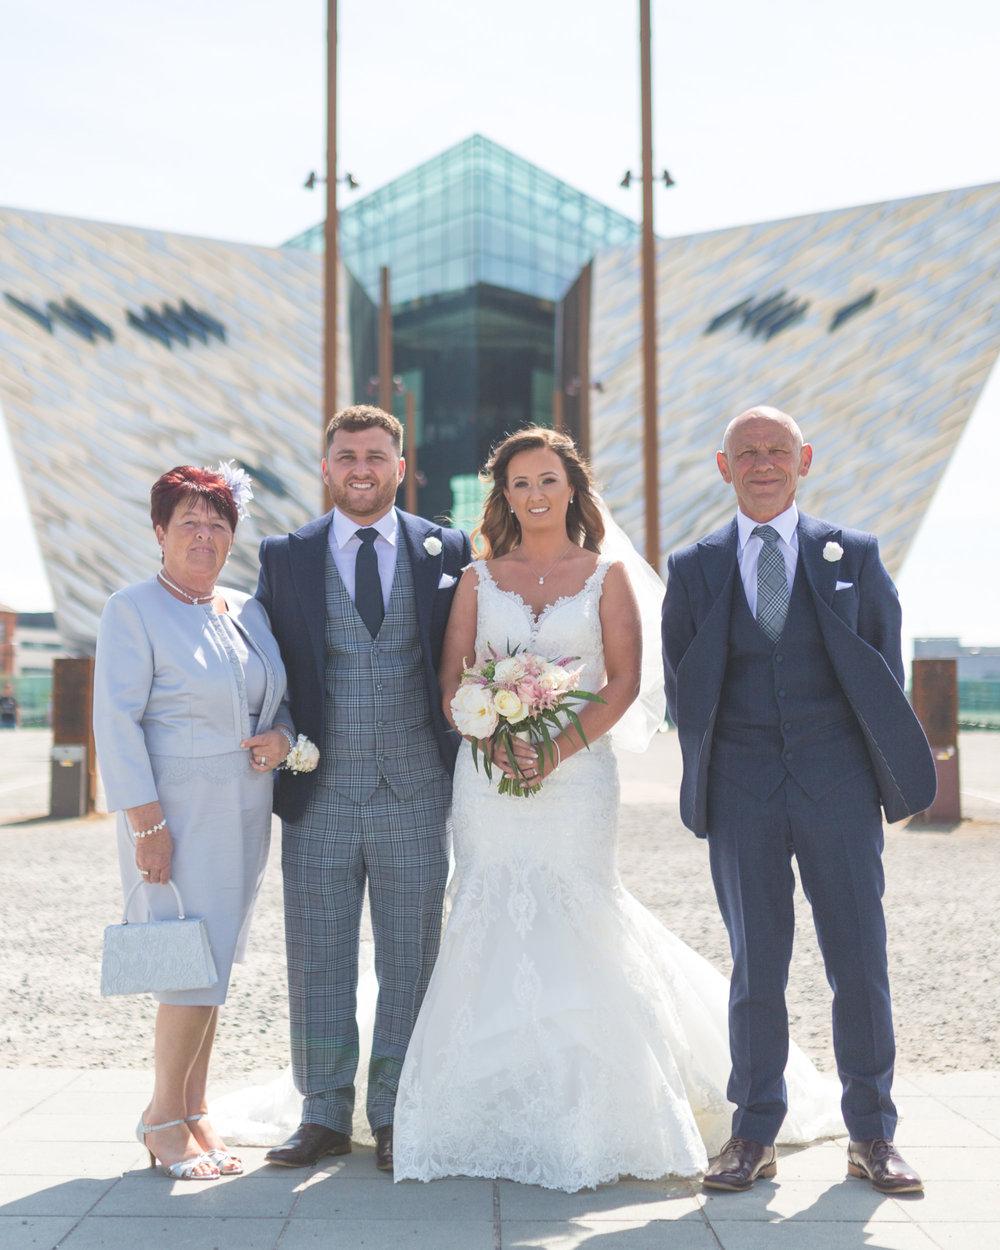 Brian McEwan | Northern Ireland Wedding Photographer | Rebecca & Michael | Portraits-27.jpg